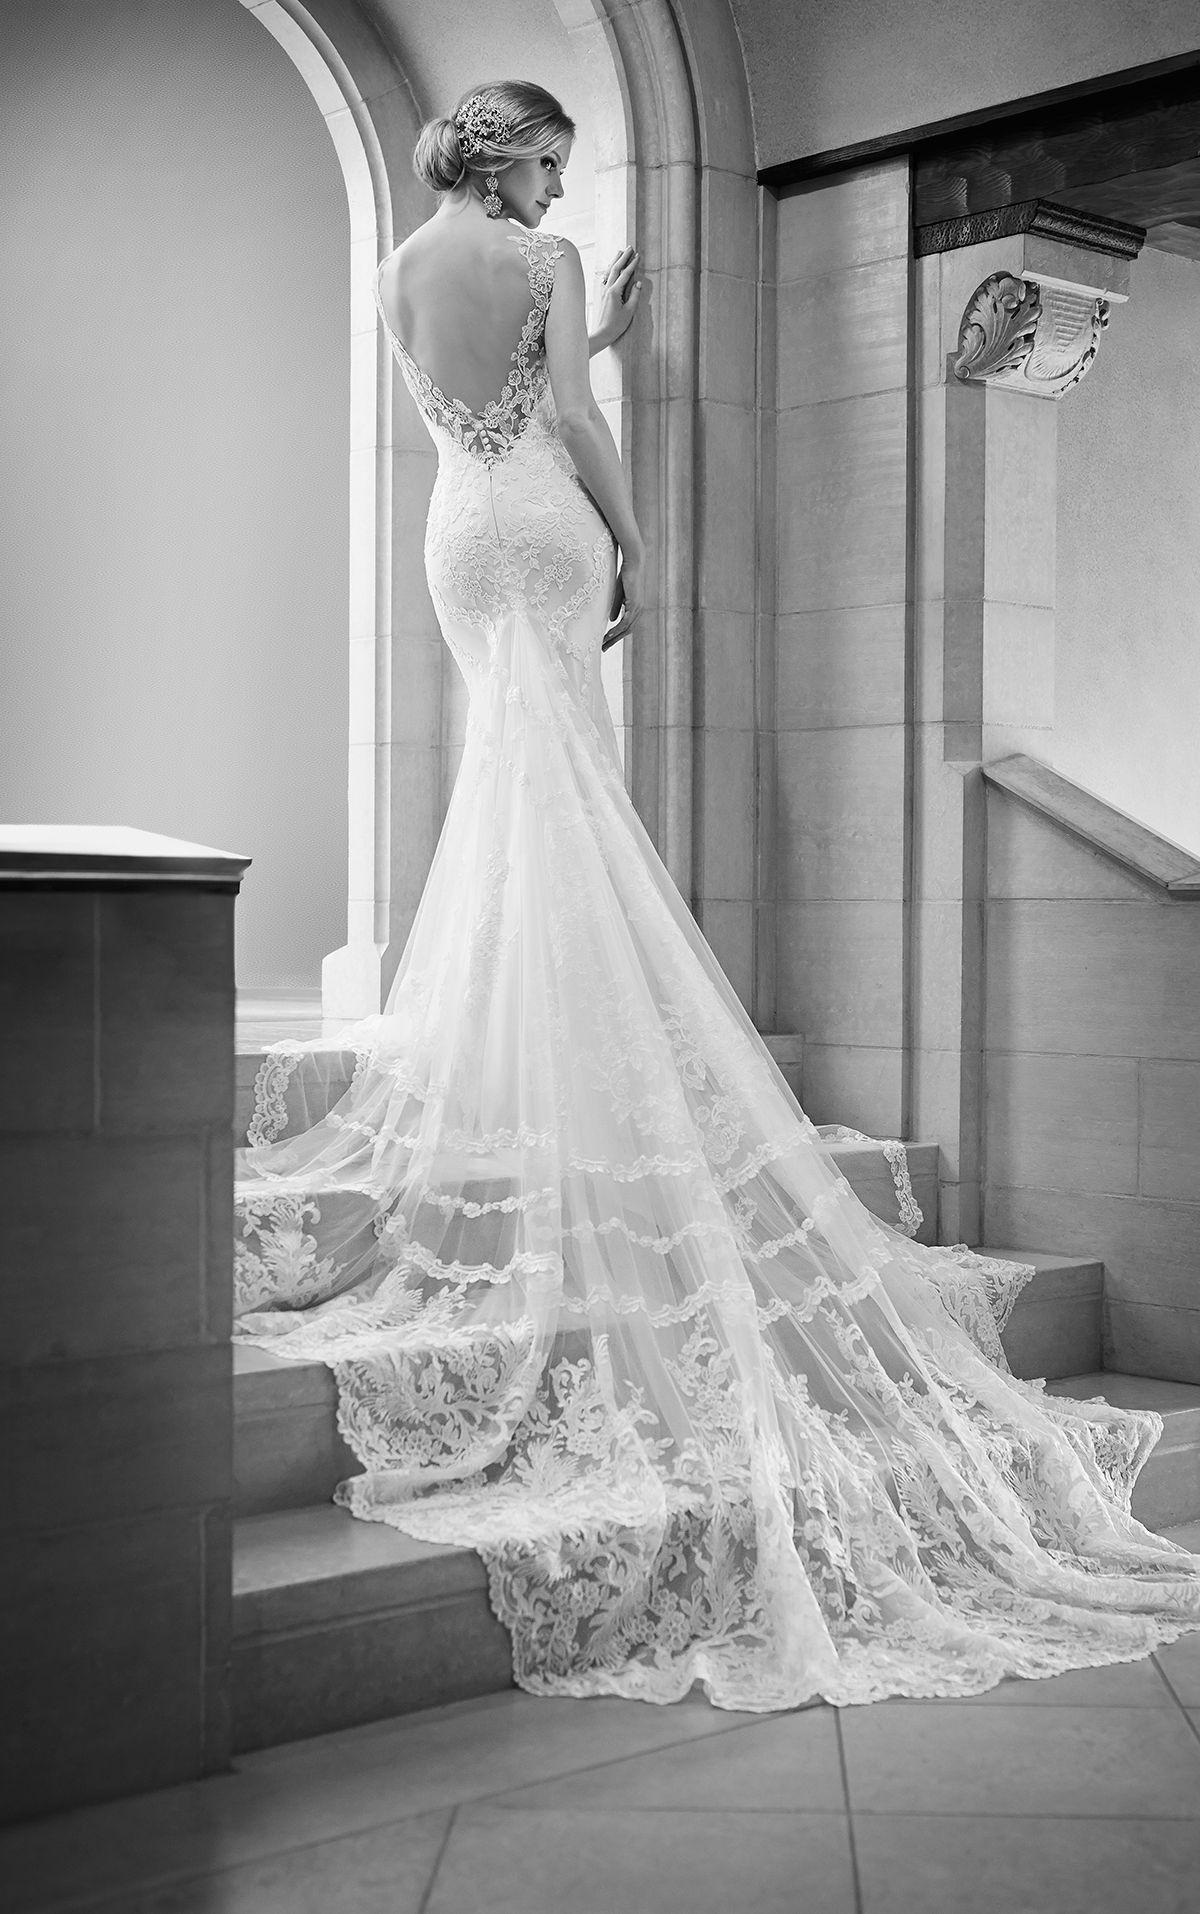 Illusion Back Wedding Dress | Martina Liana Wedding Dresses | Wedding  dresses lace, Martina liana wedding dress, Wedding dress trends